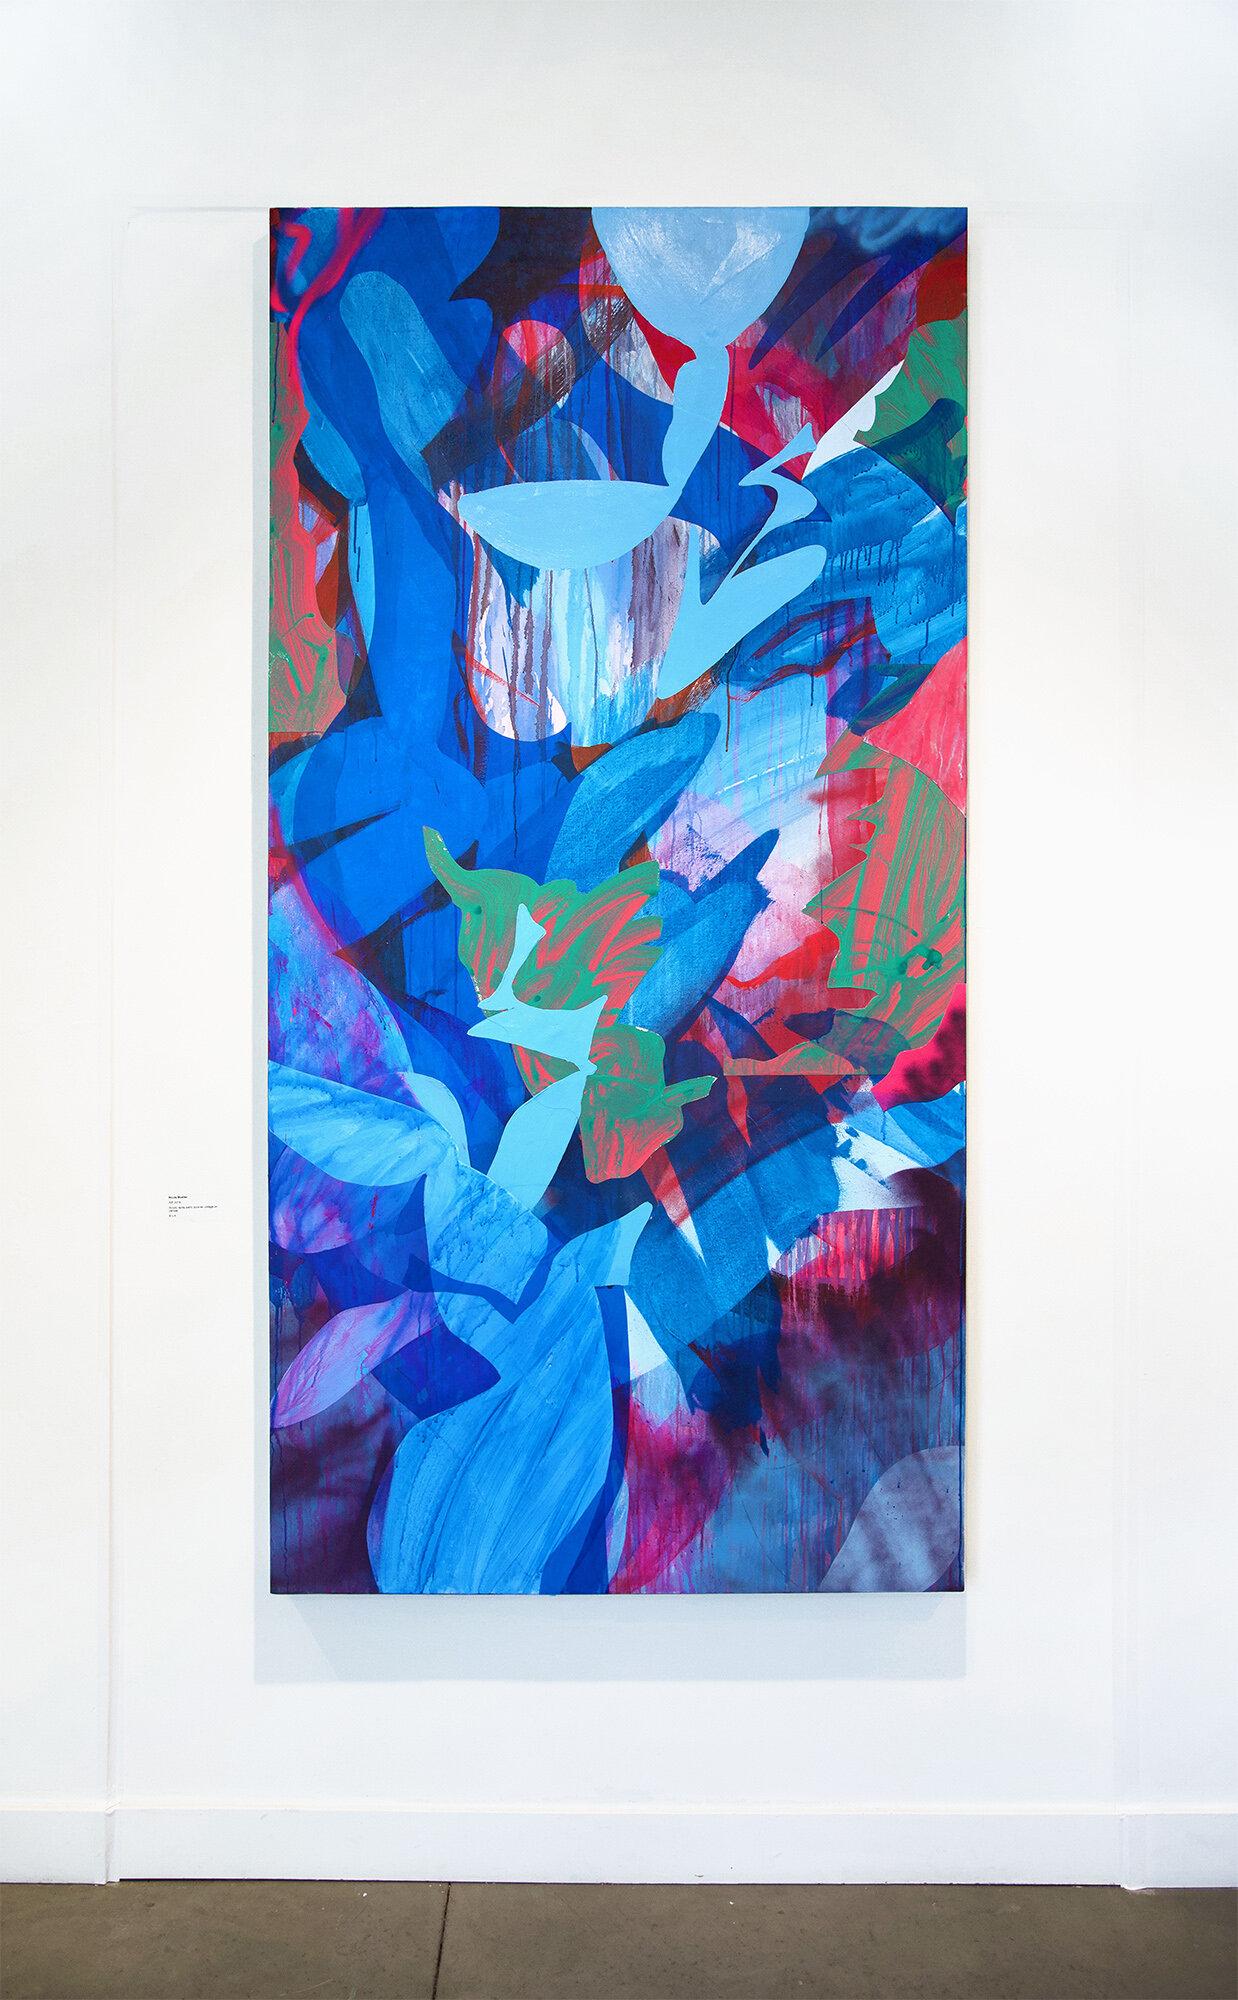 Rift , 96 x 48 in., Acrylic, spray paint, dura-lar, collage on canvas, 2018